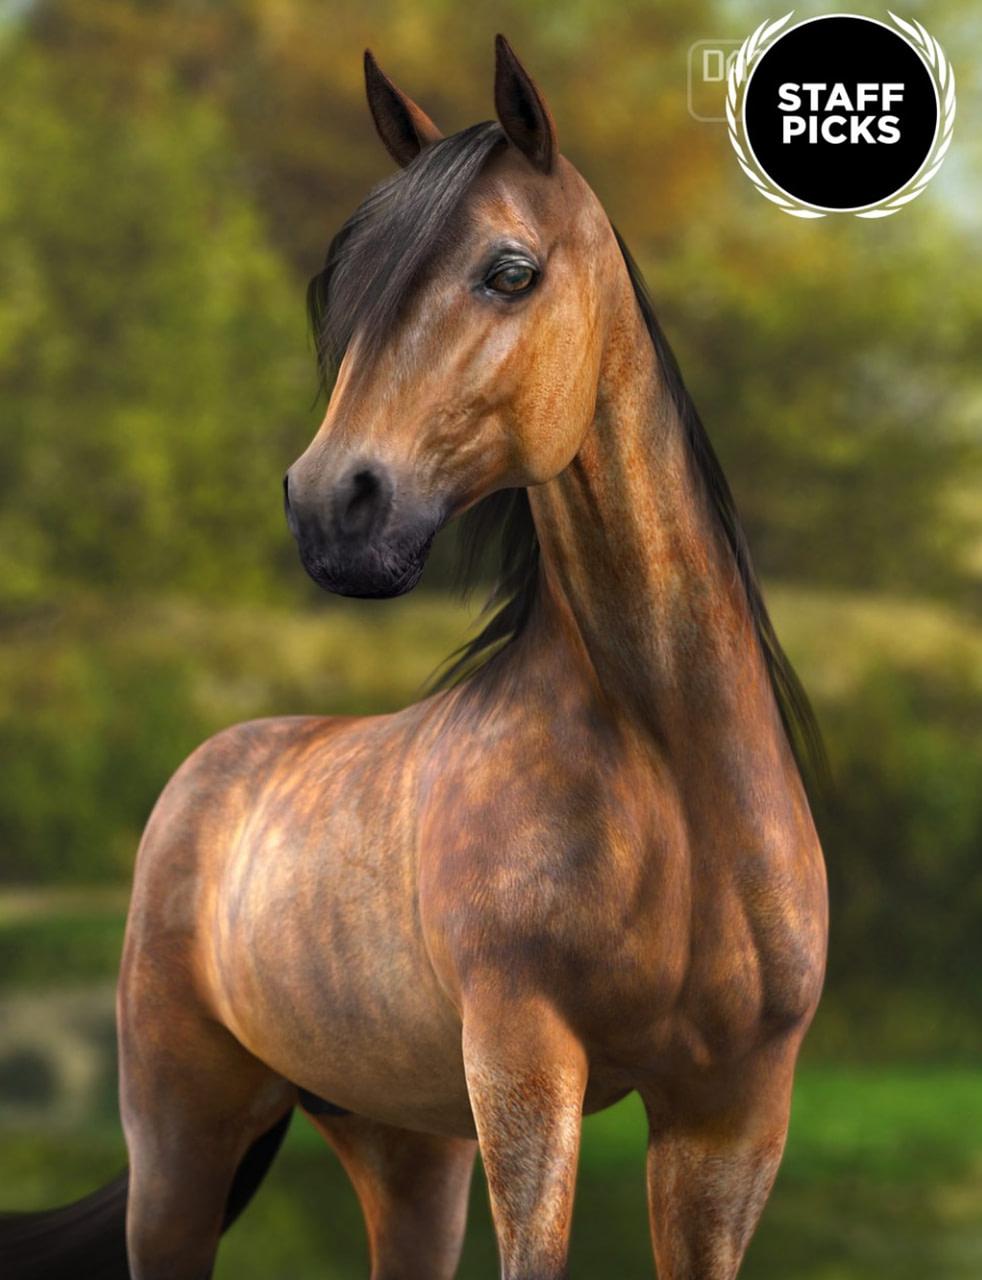 3d model of a horse for daz studio